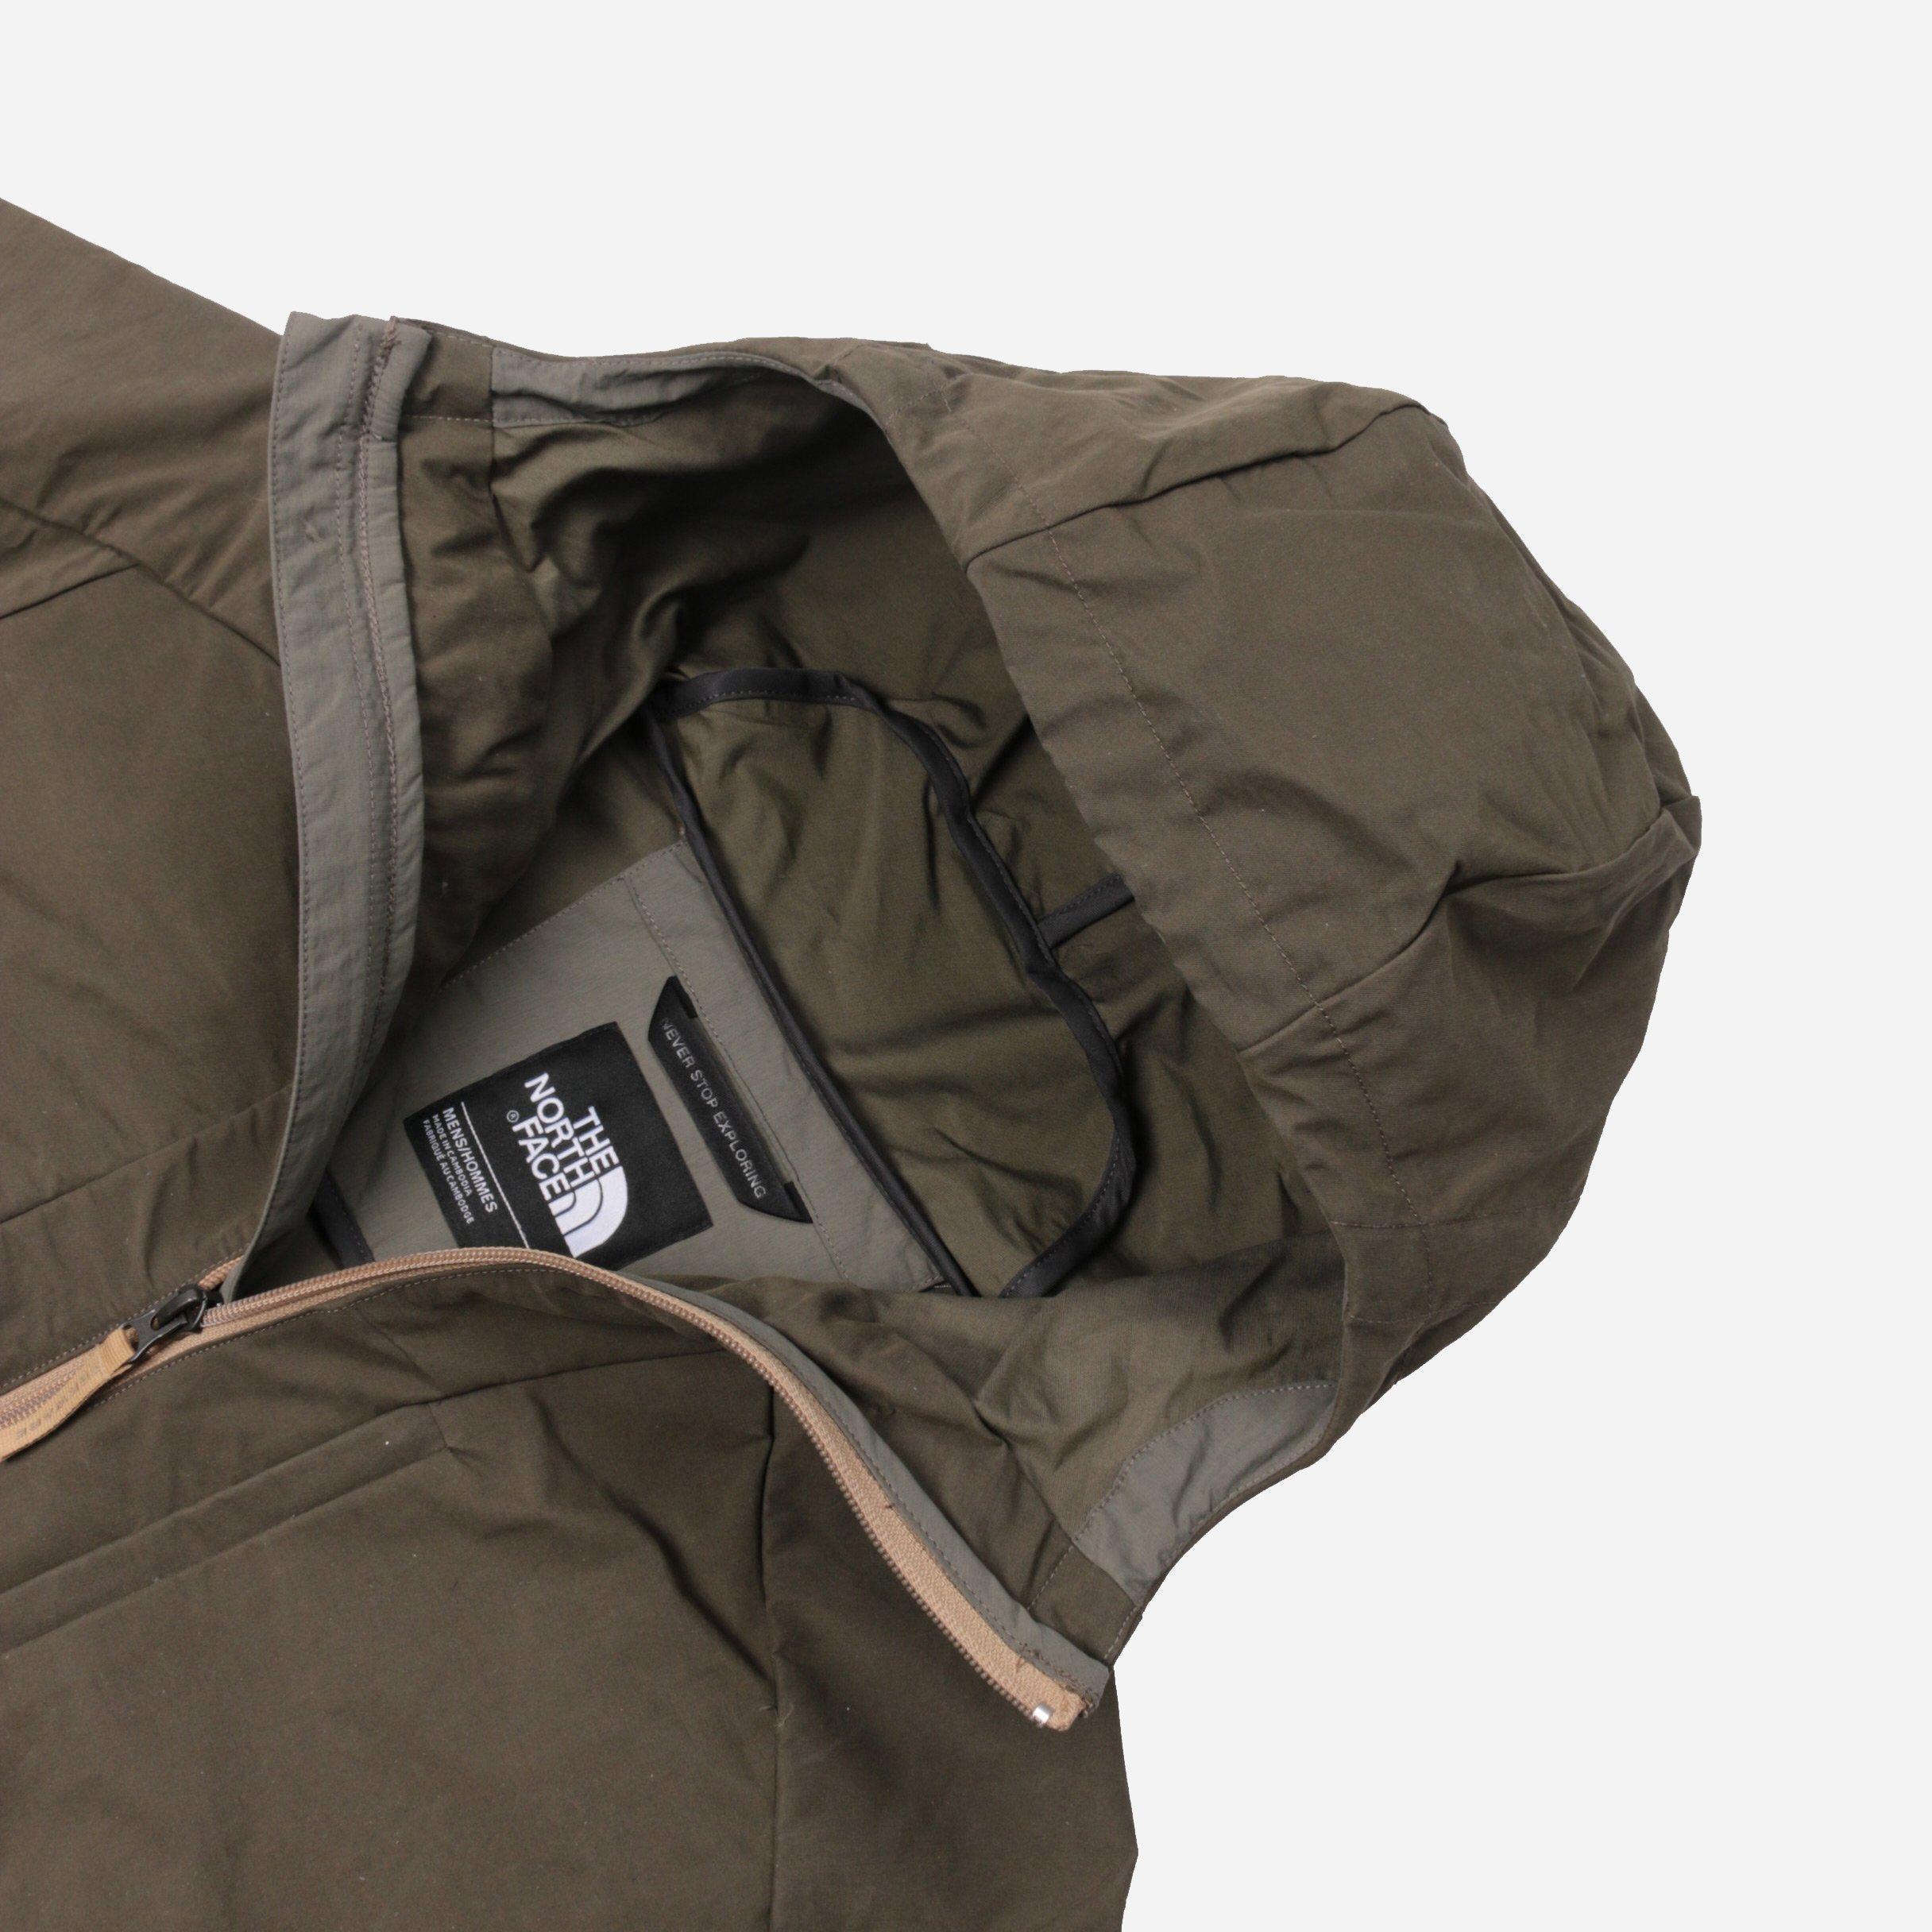 Britse winkel koop online winkel The North Face Green Exploration Jacket for men